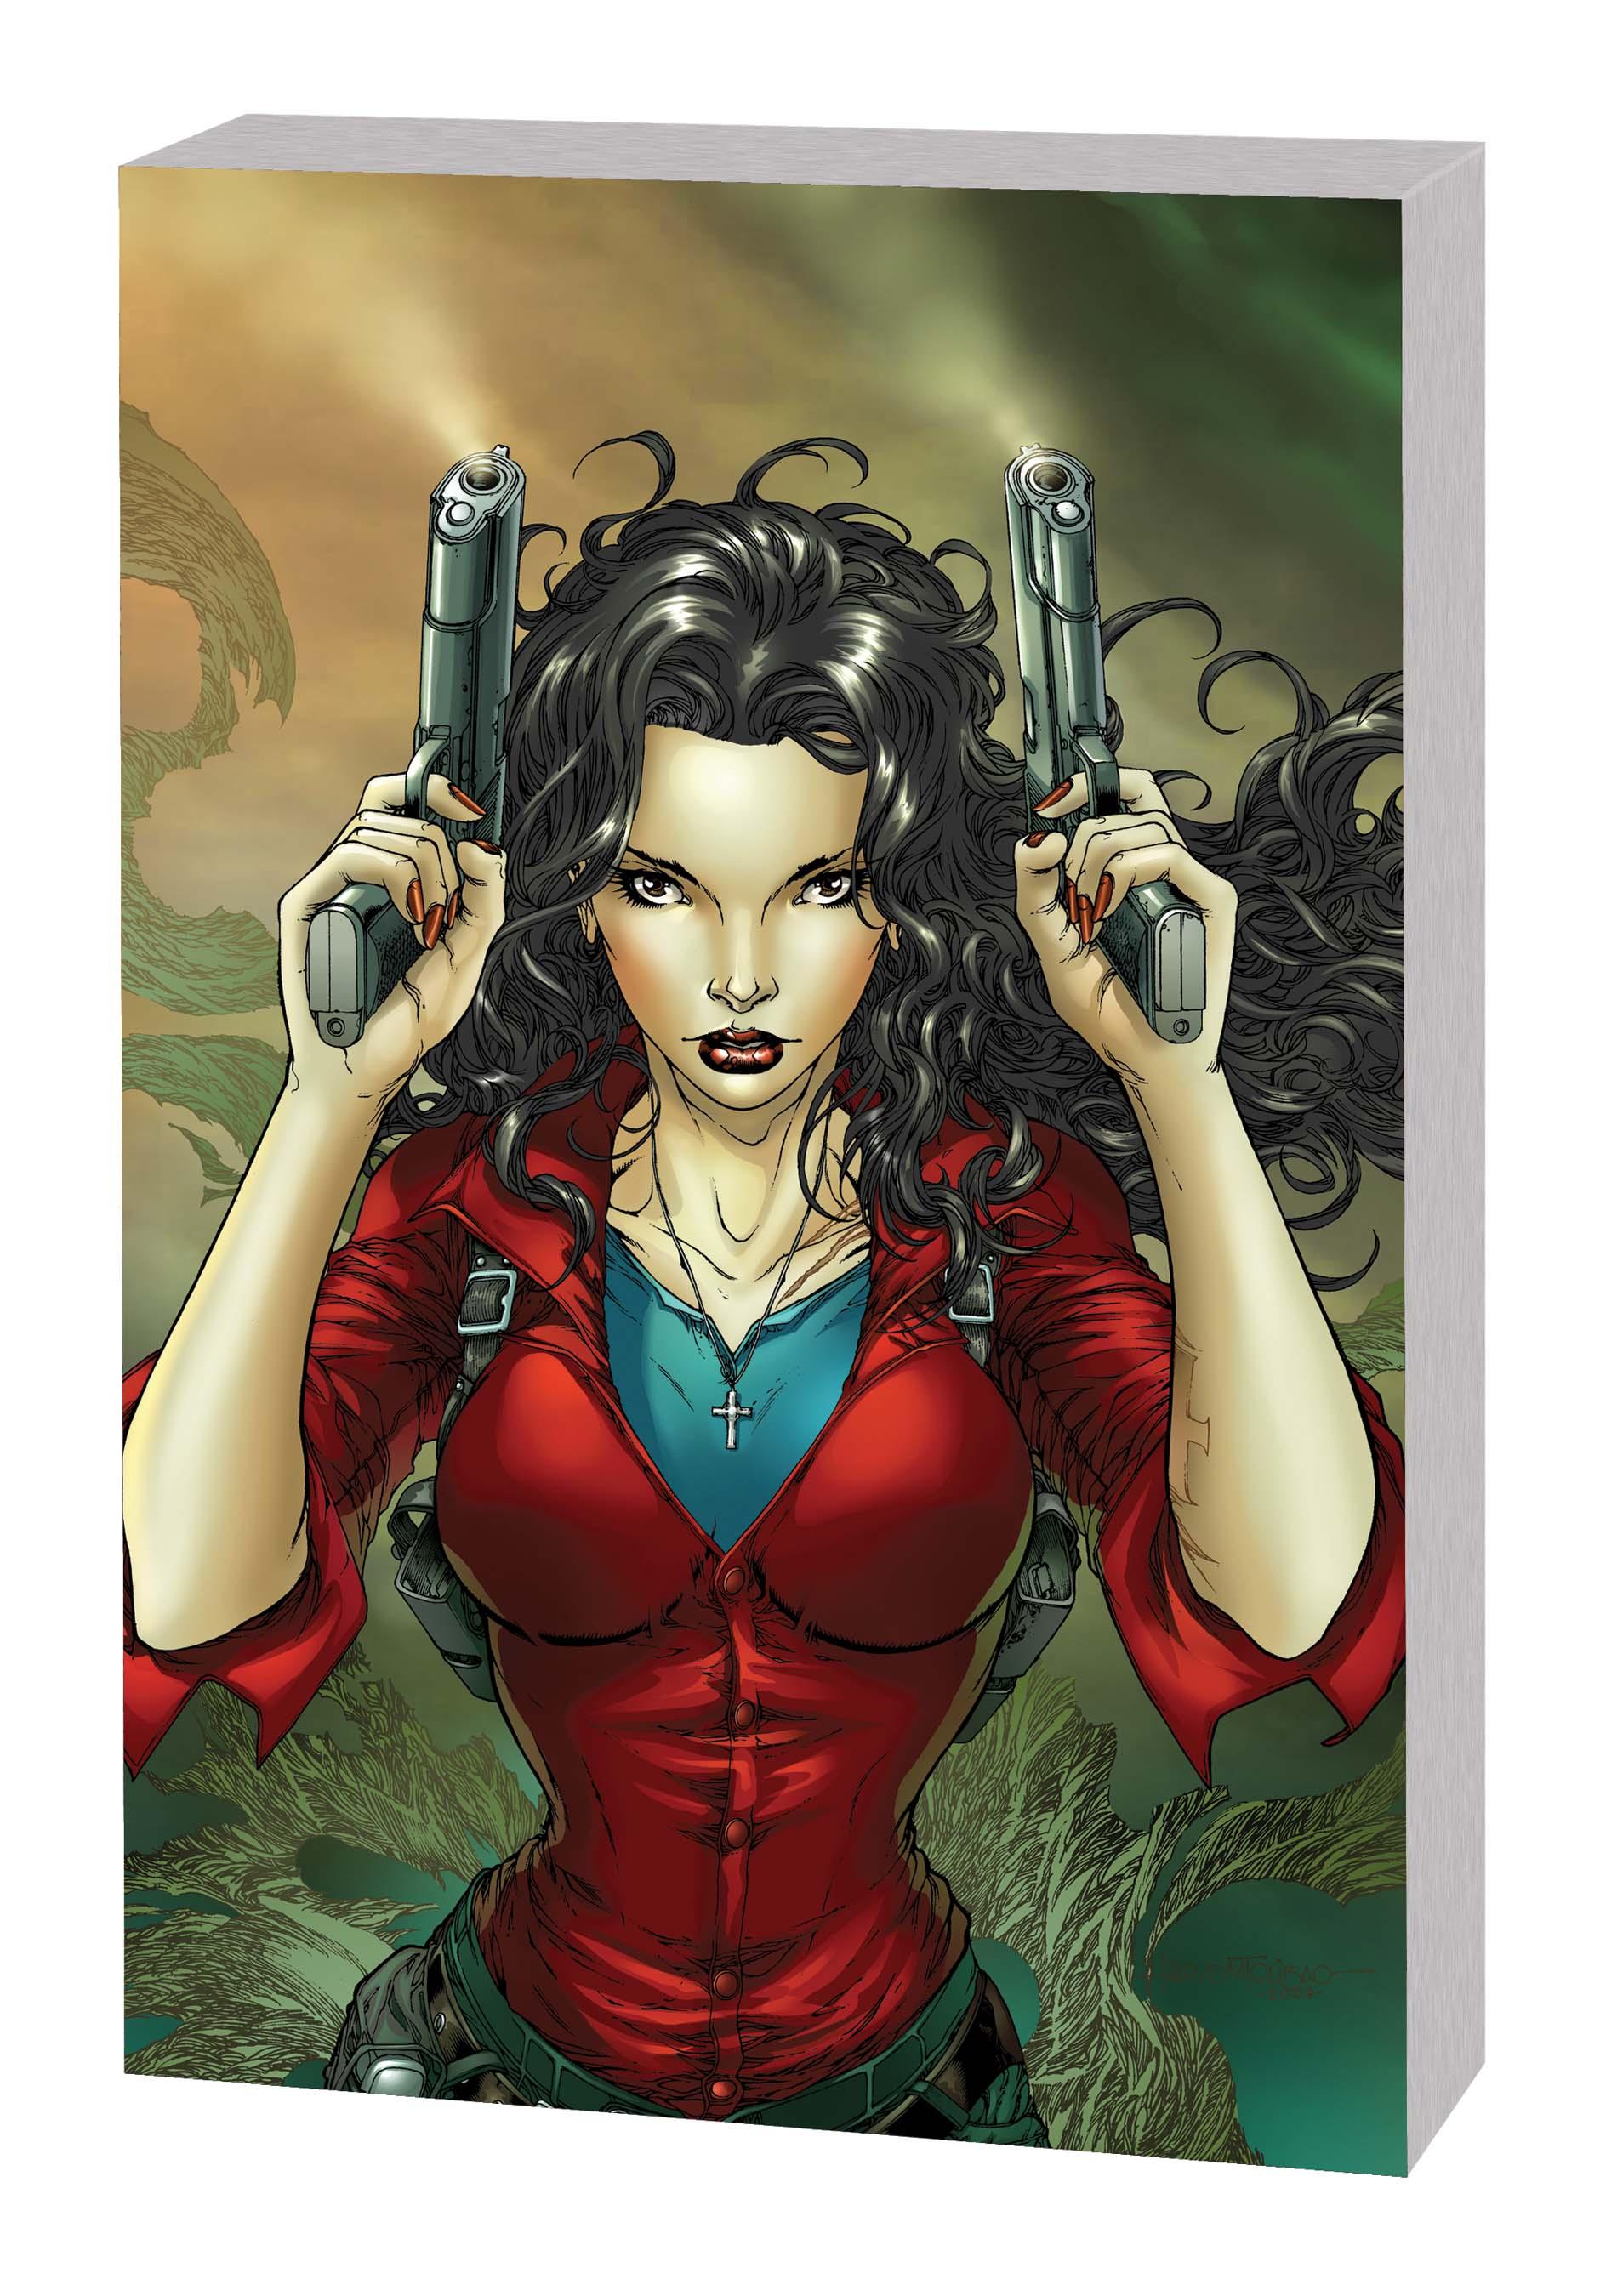 Anita Blake, Vampire Hunter: The Laughing Corpse Ultimate Collection (Trade Paperback)